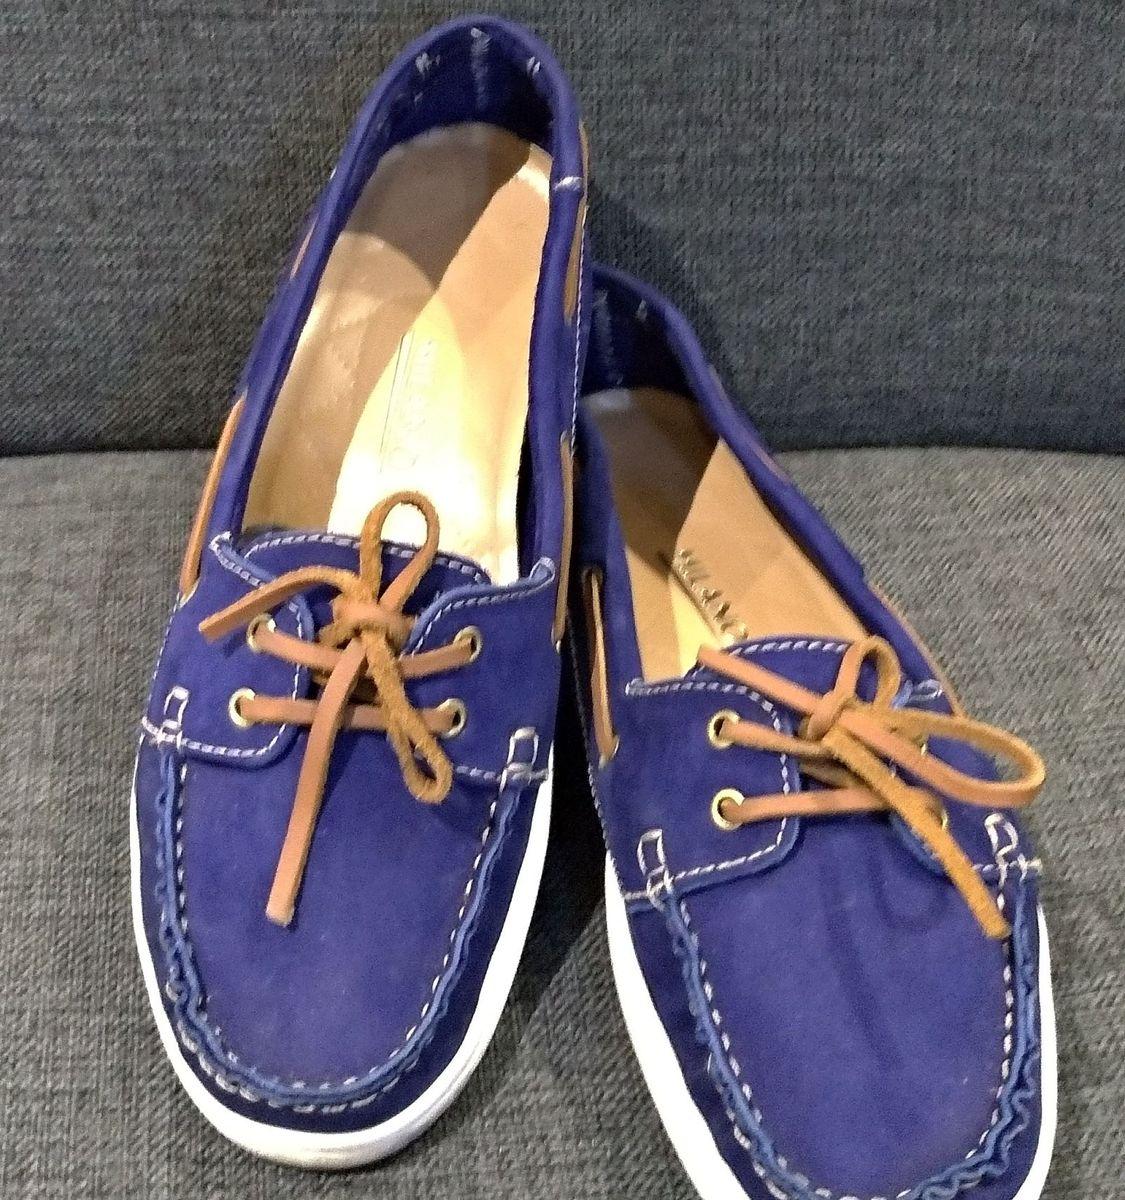 bac6cdc8c2 mocassim feminino azul royal - sapatos milano.  Czm6ly9wag90b3muzw5qb2vplmnvbs5ici9wcm9kdwn0cy82ote2nje3lzliody1mtq3mjm2mmy2odjlodnhowy3otq5mdk0owm2lmpwzw  ...